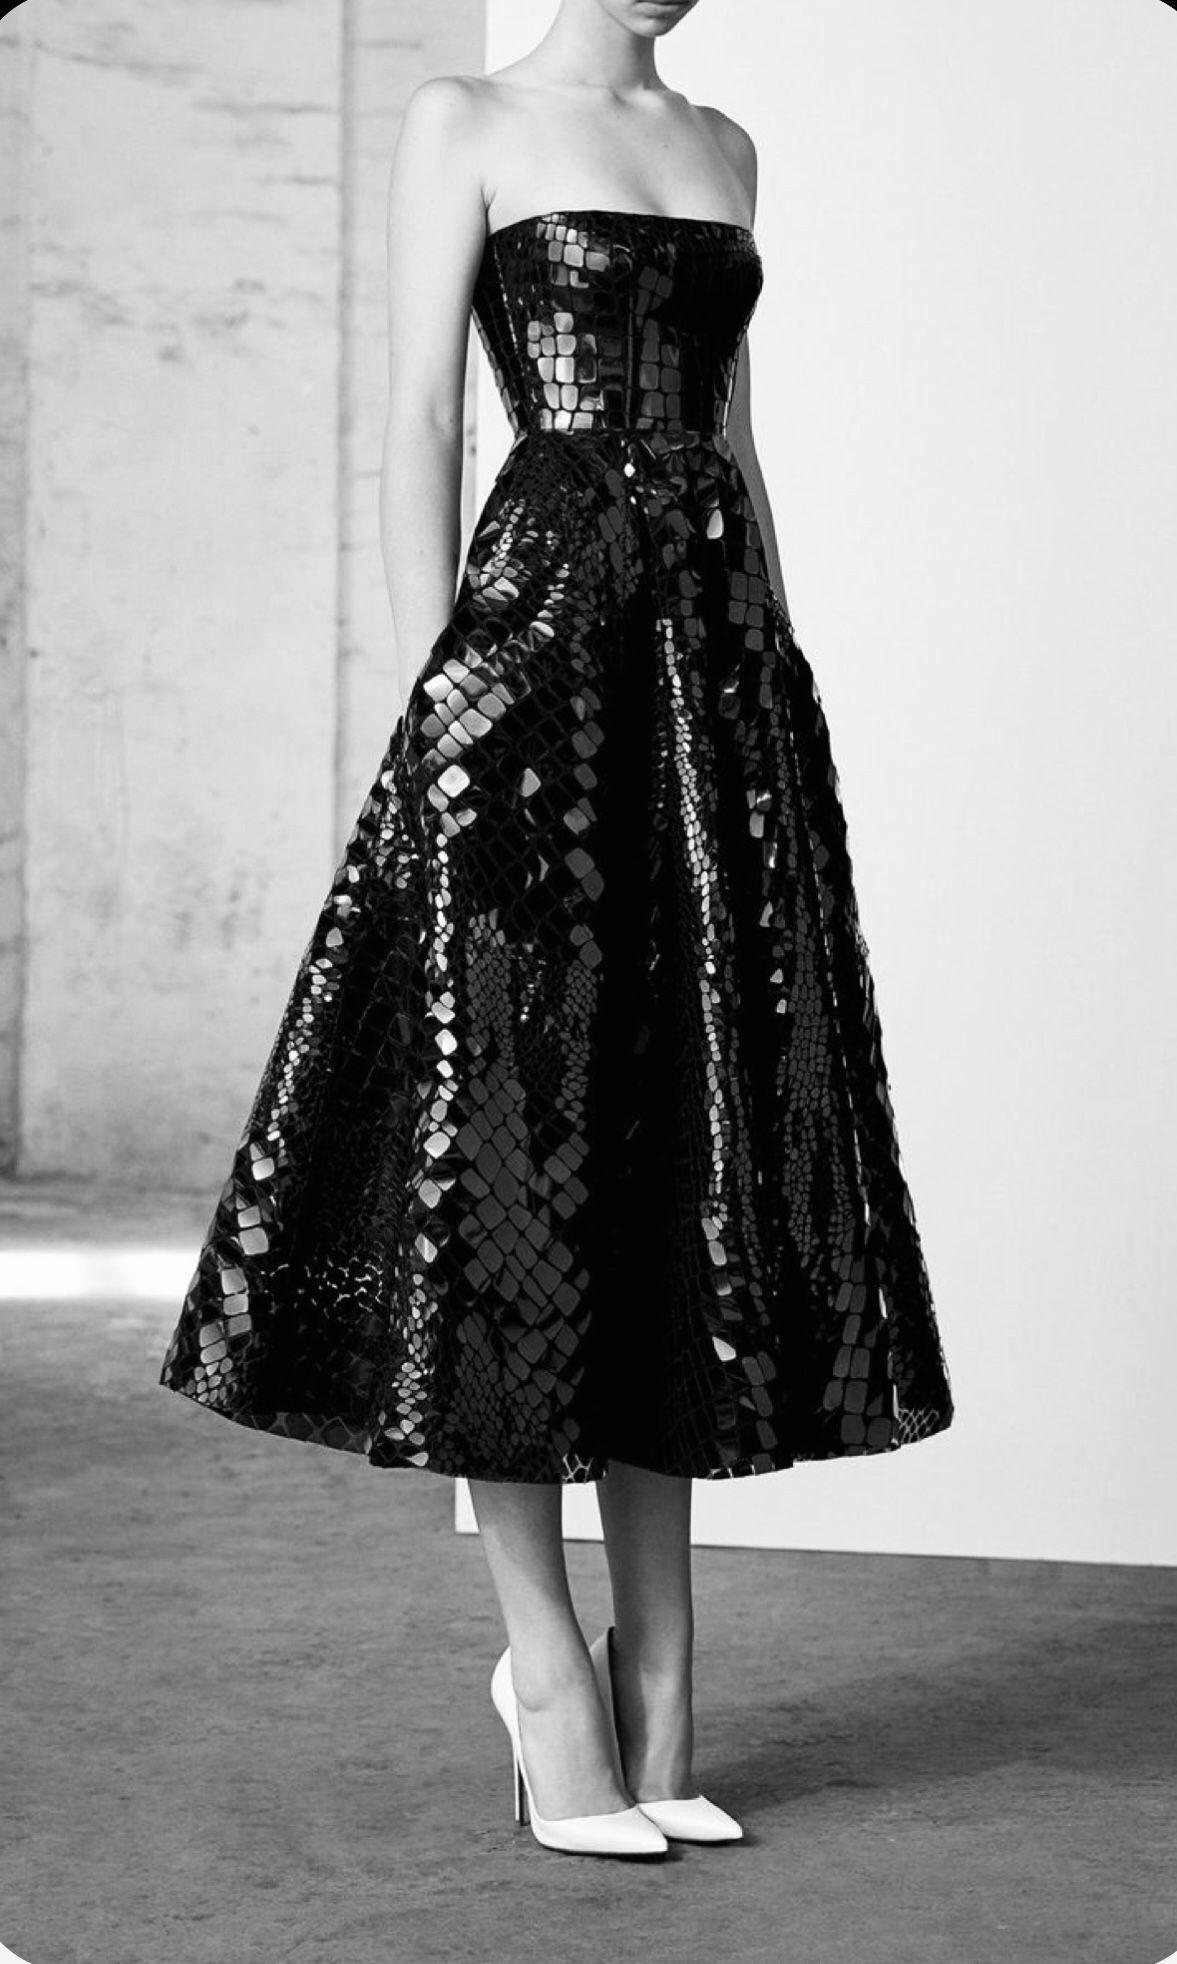 Pin By Cathreen Benny On Little Black Dress Strapless Midi Dress Pretty Dresses Dresses [ 1964 x 1177 Pixel ]